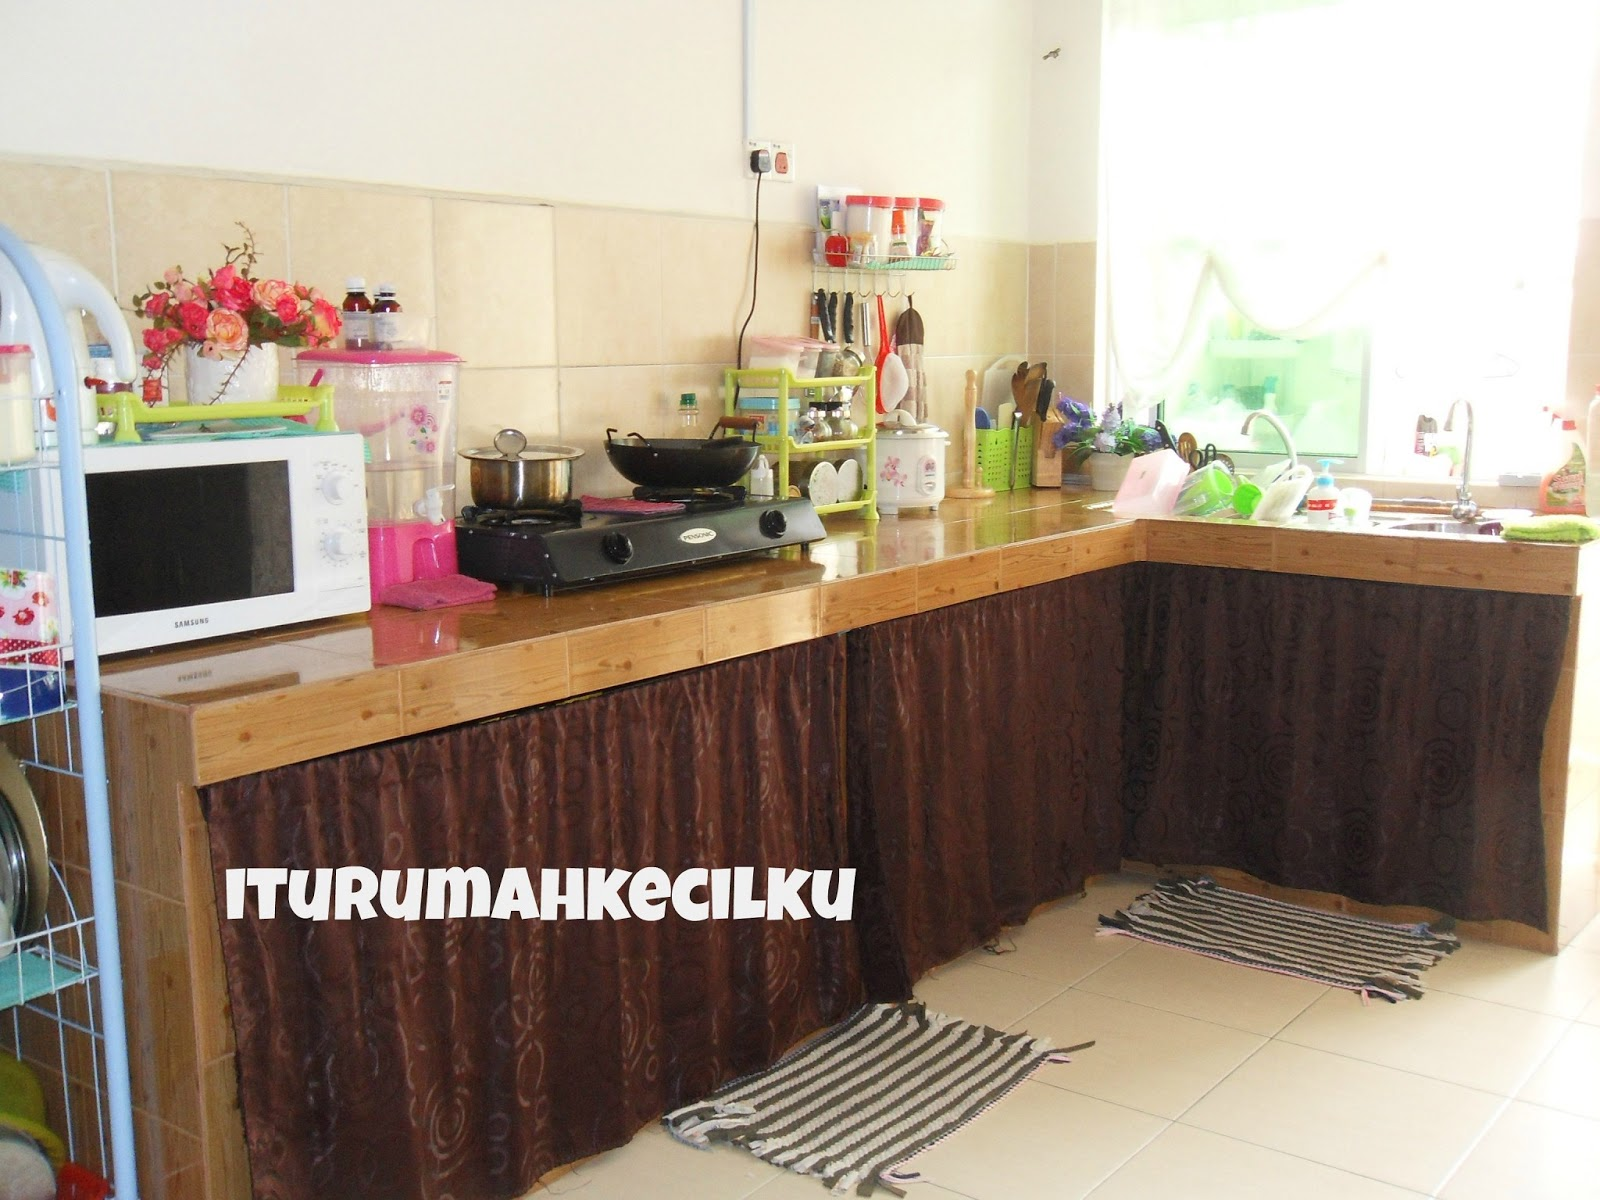 Iturumahkecilku Thedailyroutine Step 1 Kitchen